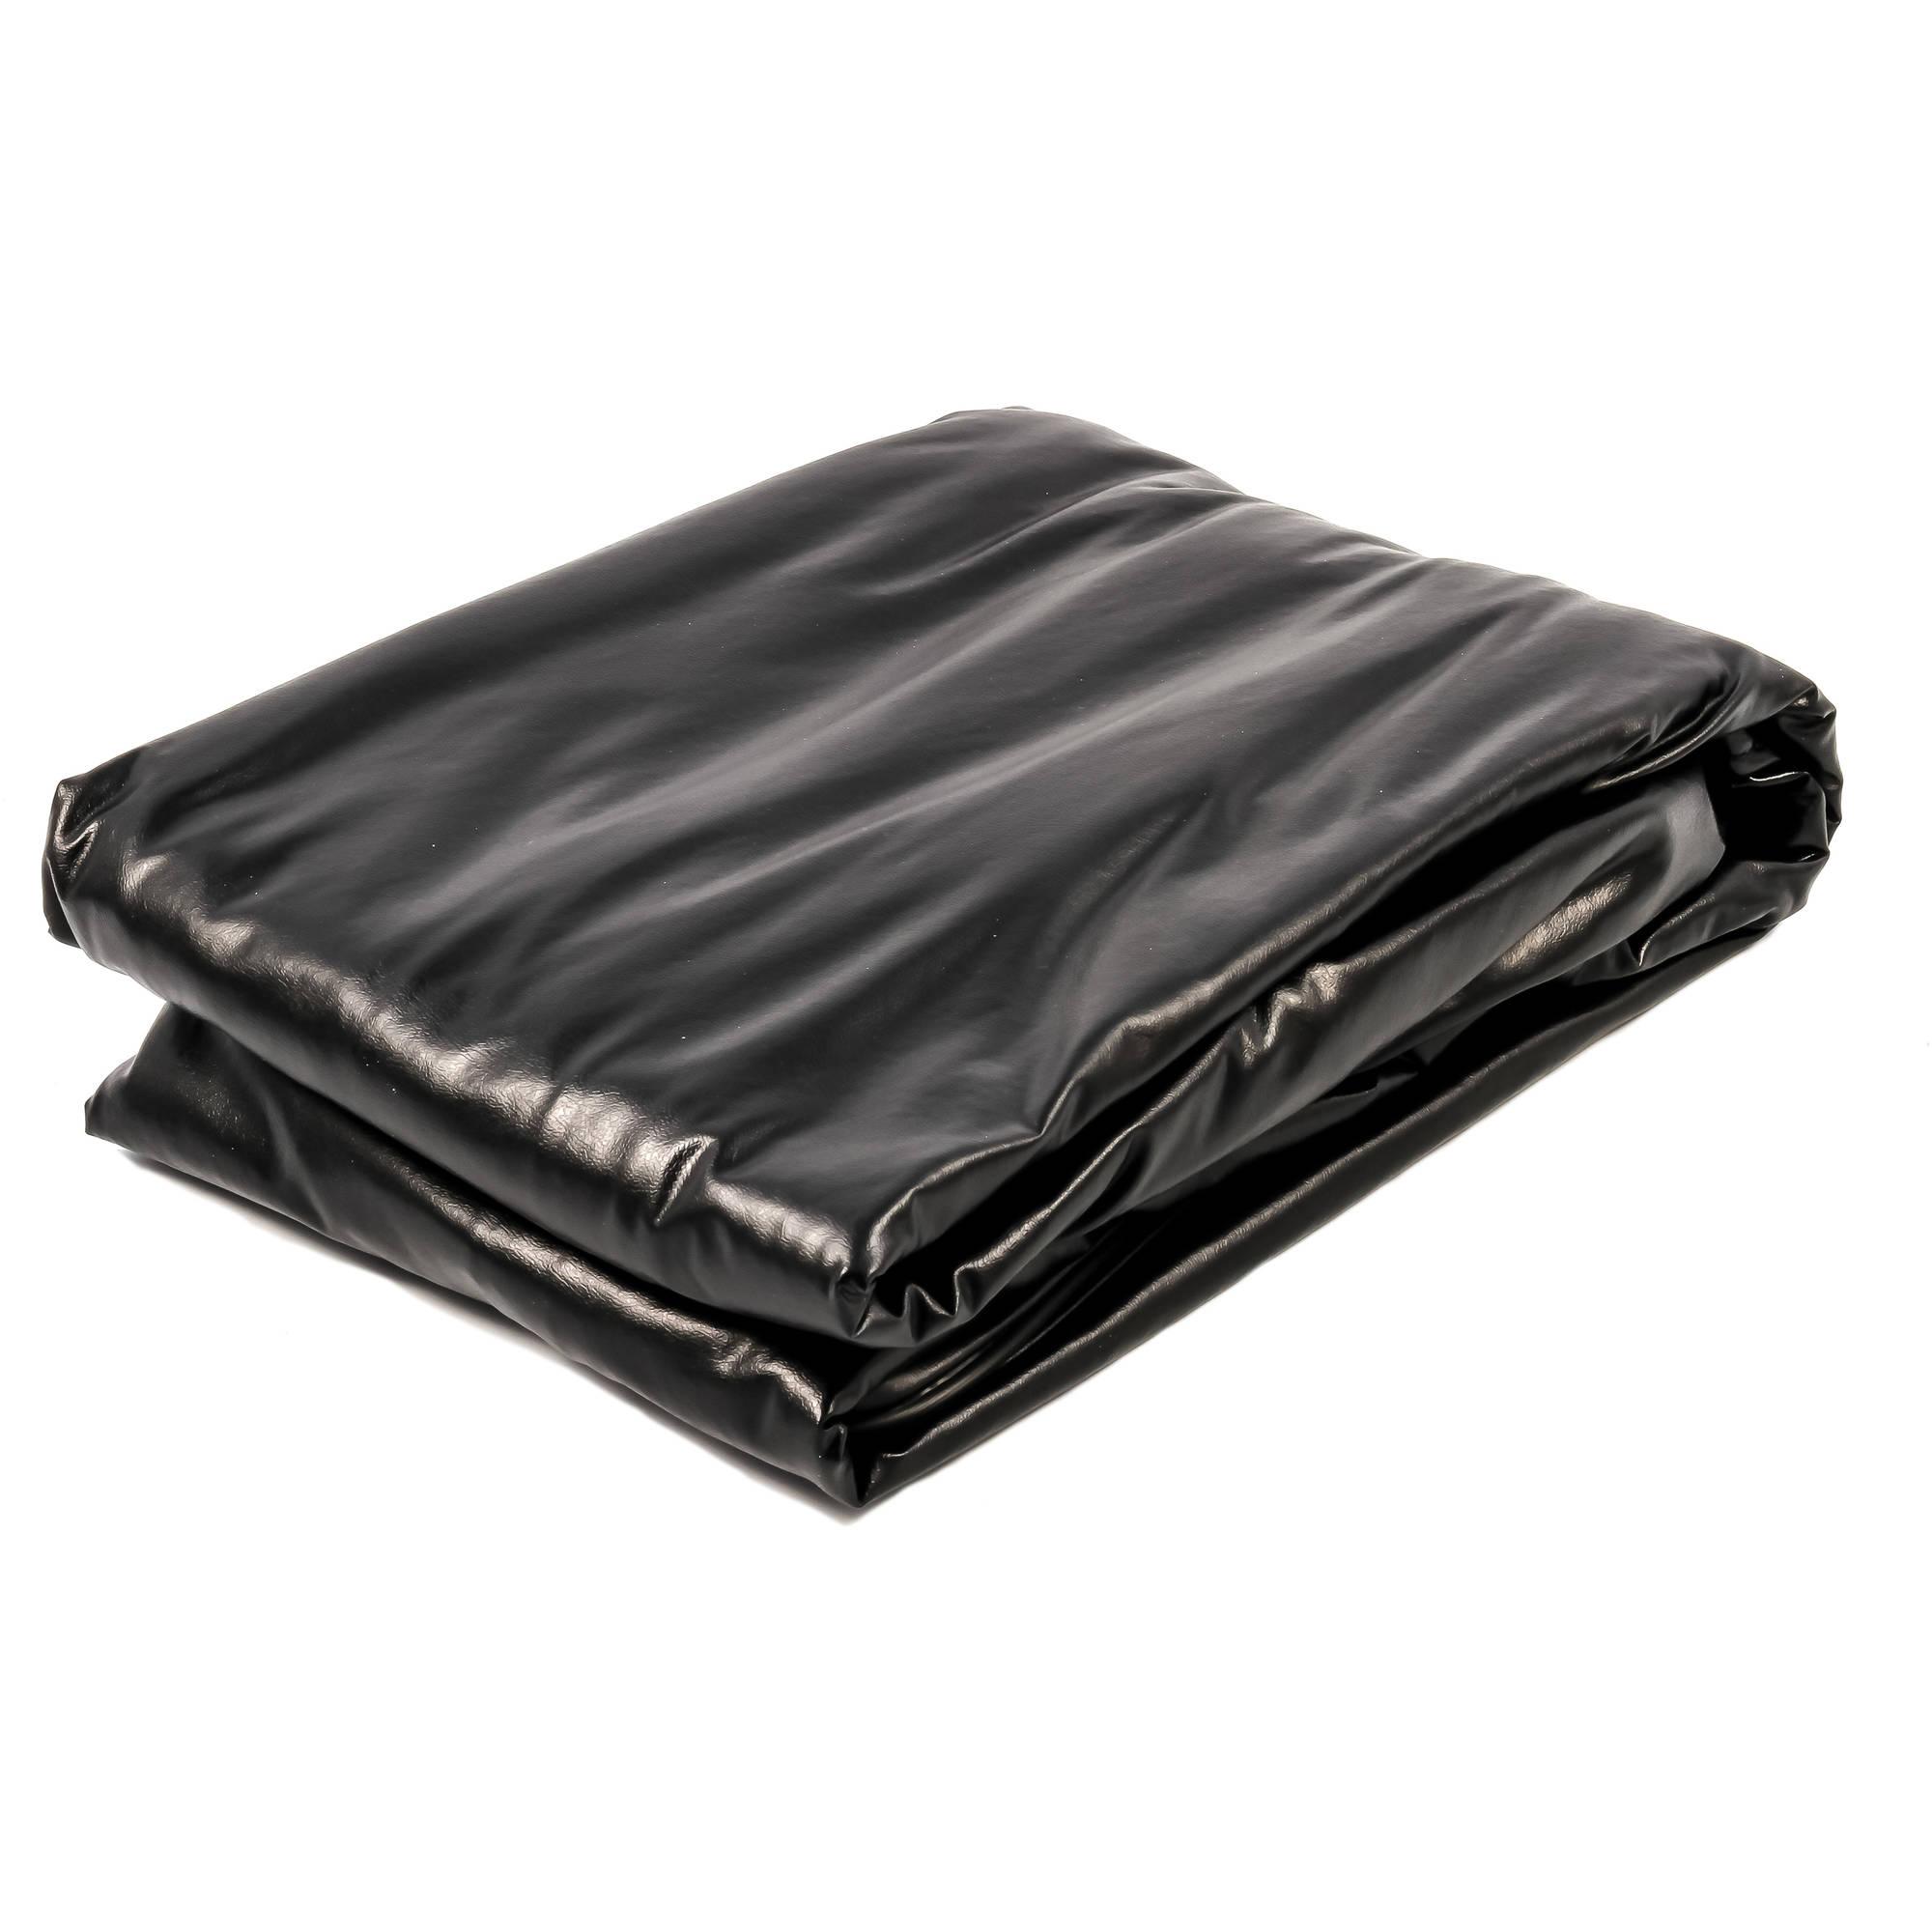 Camco 45262 Black Vinyl Air Conditioner Cover